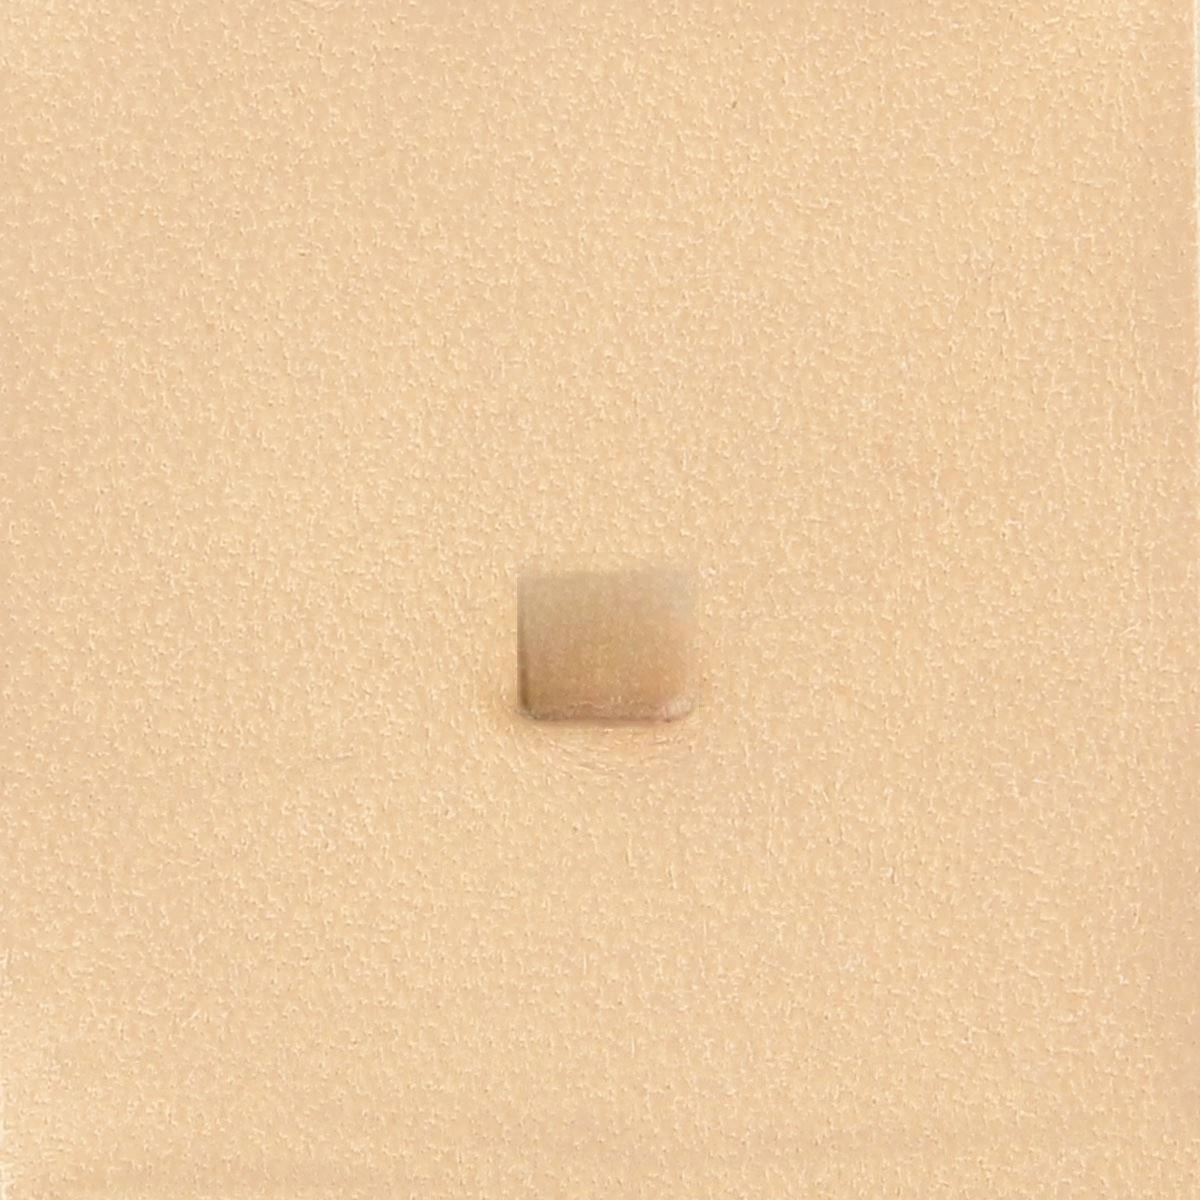 Matoir sur manche - Beveler lisse 7,5 mm - 6201 - B201